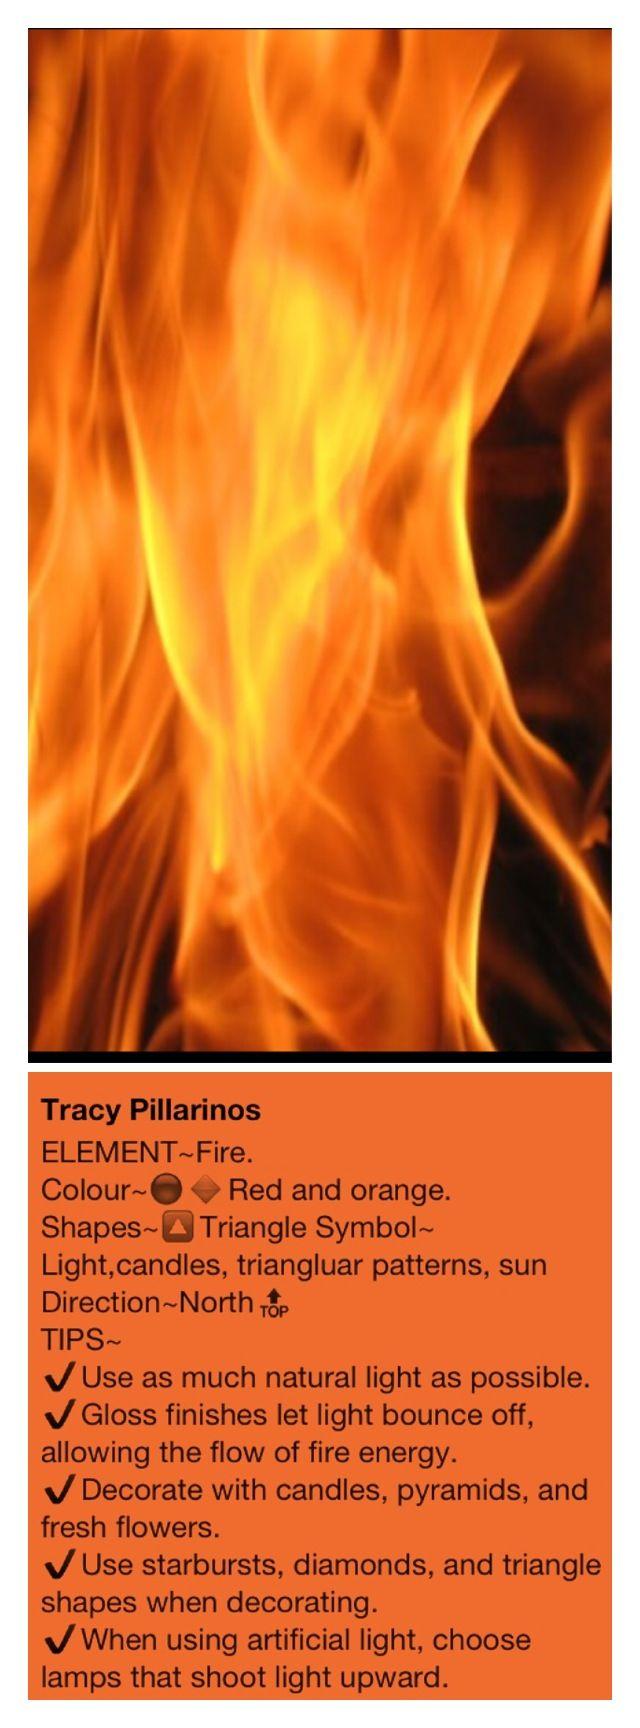 The Elements of Feng Shui  FIRE. From my board #Feng Shui by #Luxurydotcom